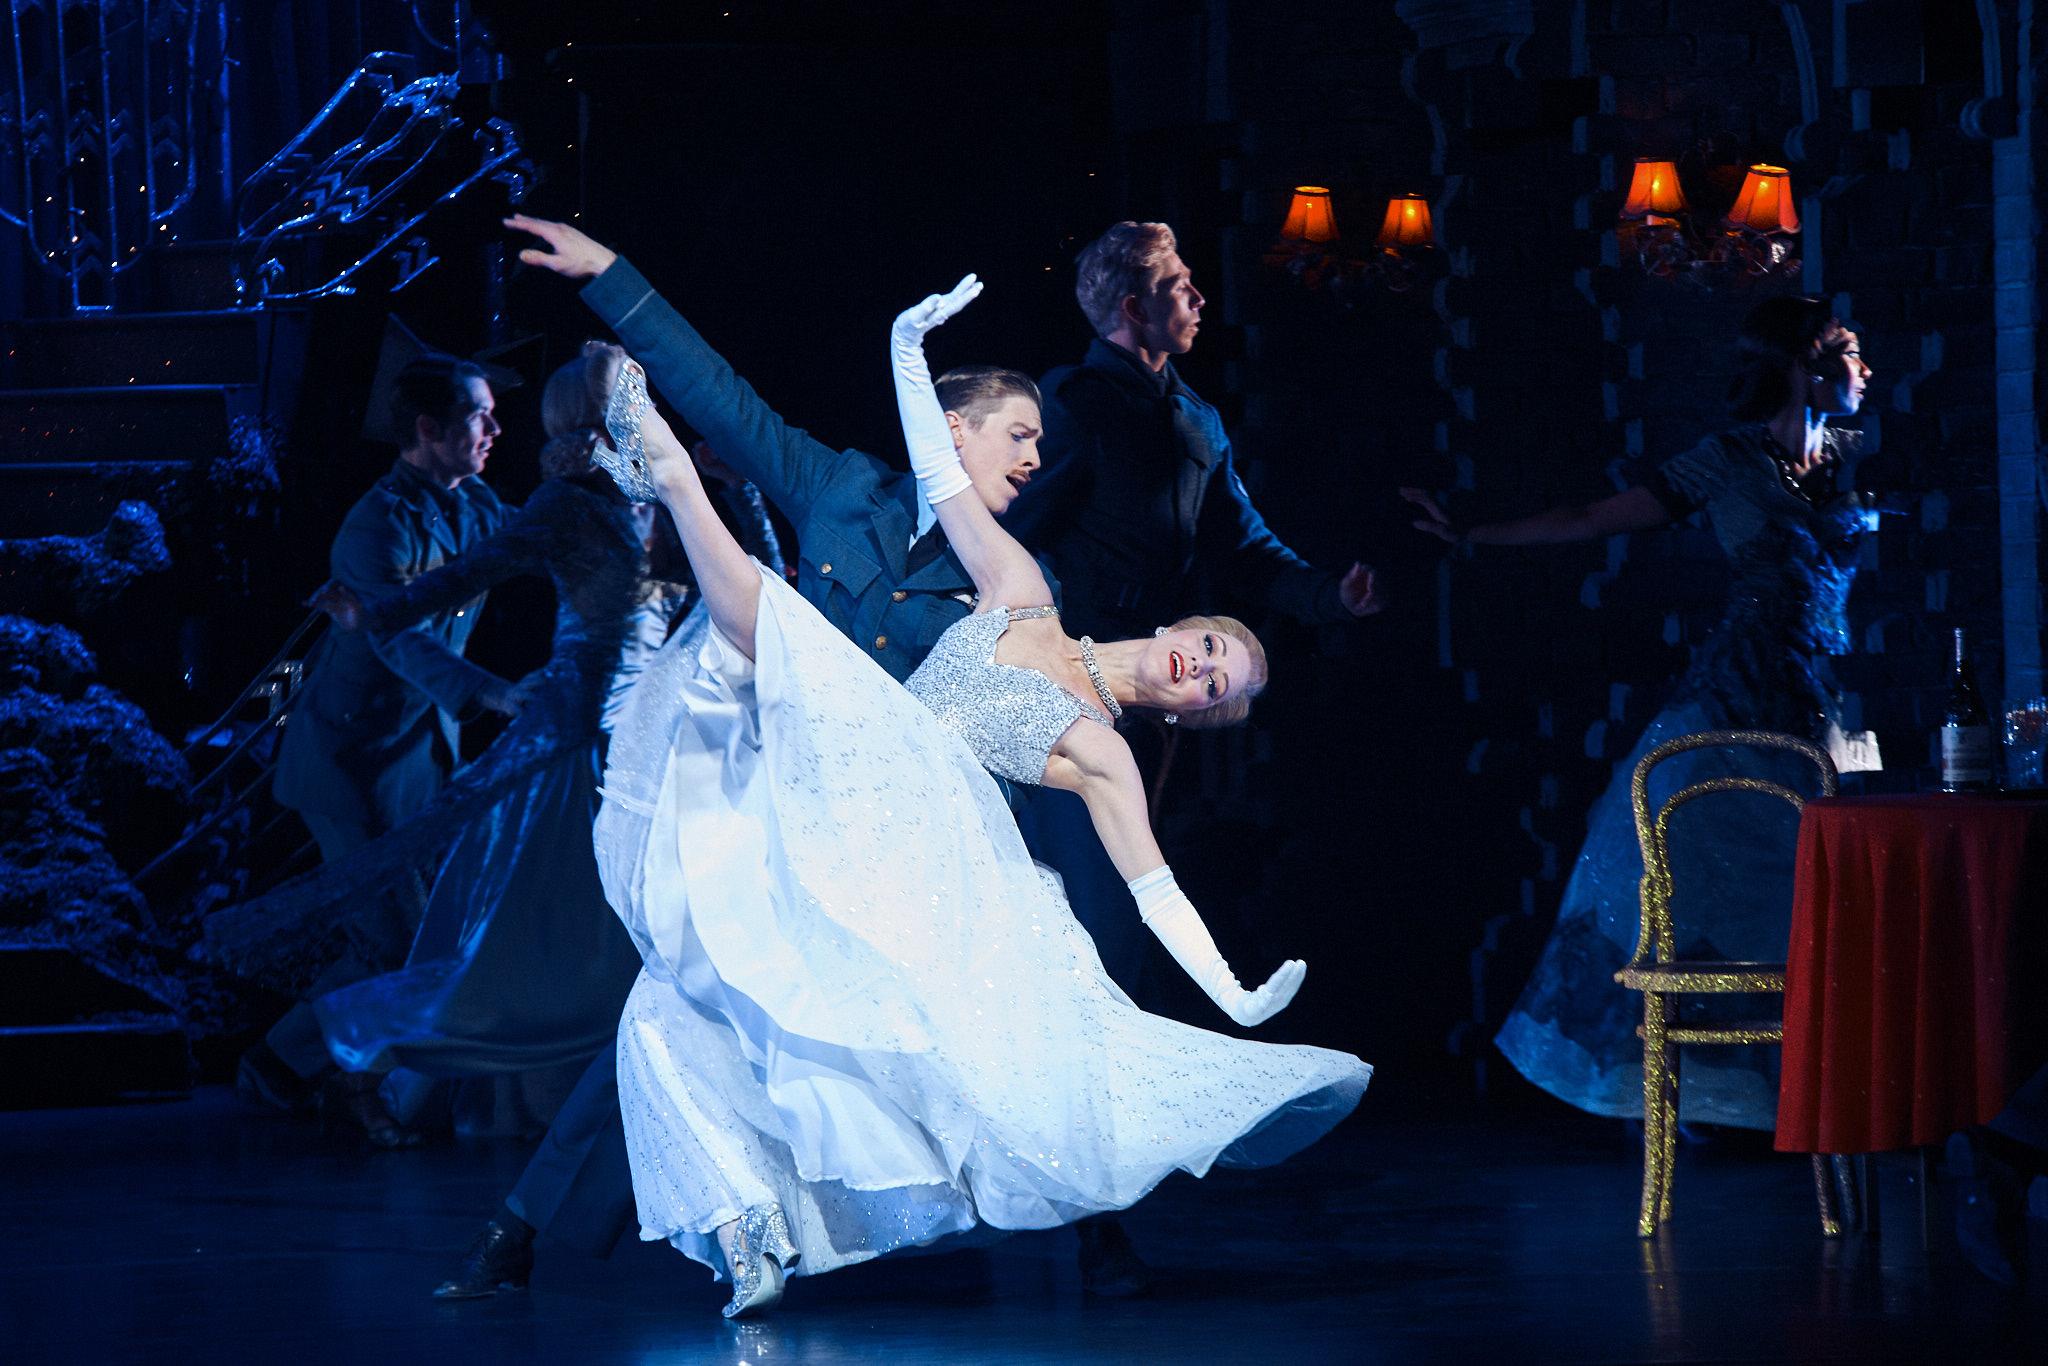 image of Mathew Bourne's New Adventures Cinderella dance photography, fotografia de escena, fotografo de danza, dance photographer, stage photography